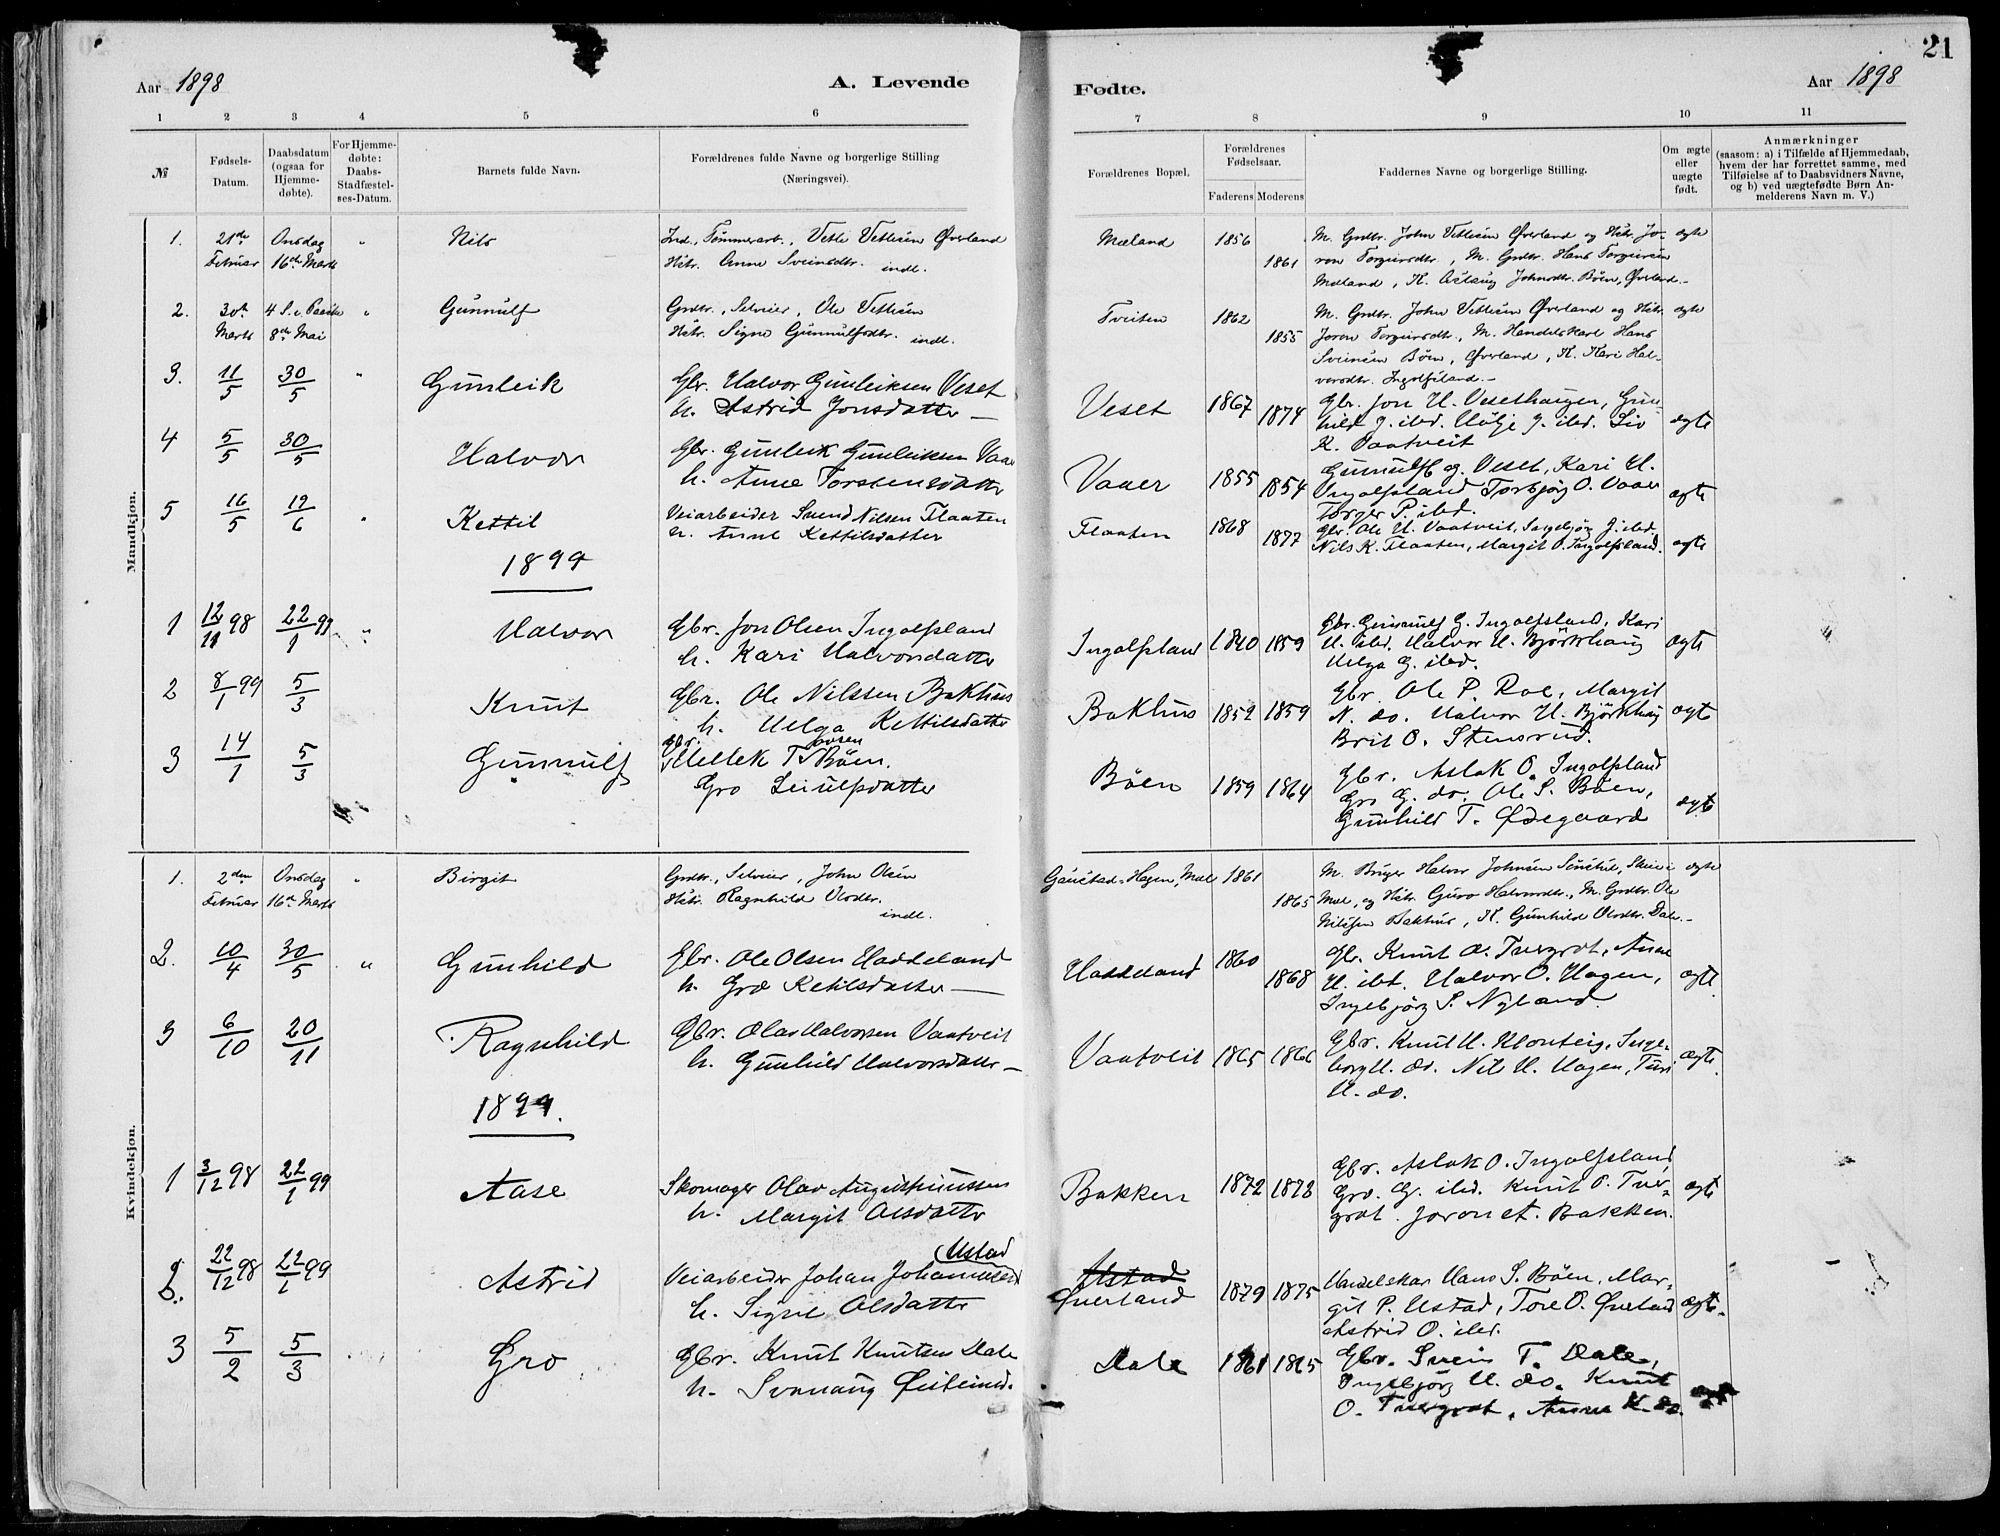 SAKO, Rjukan kirkebøker, F/Fa/L0001: Ministerialbok nr. 1, 1878-1912, s. 21